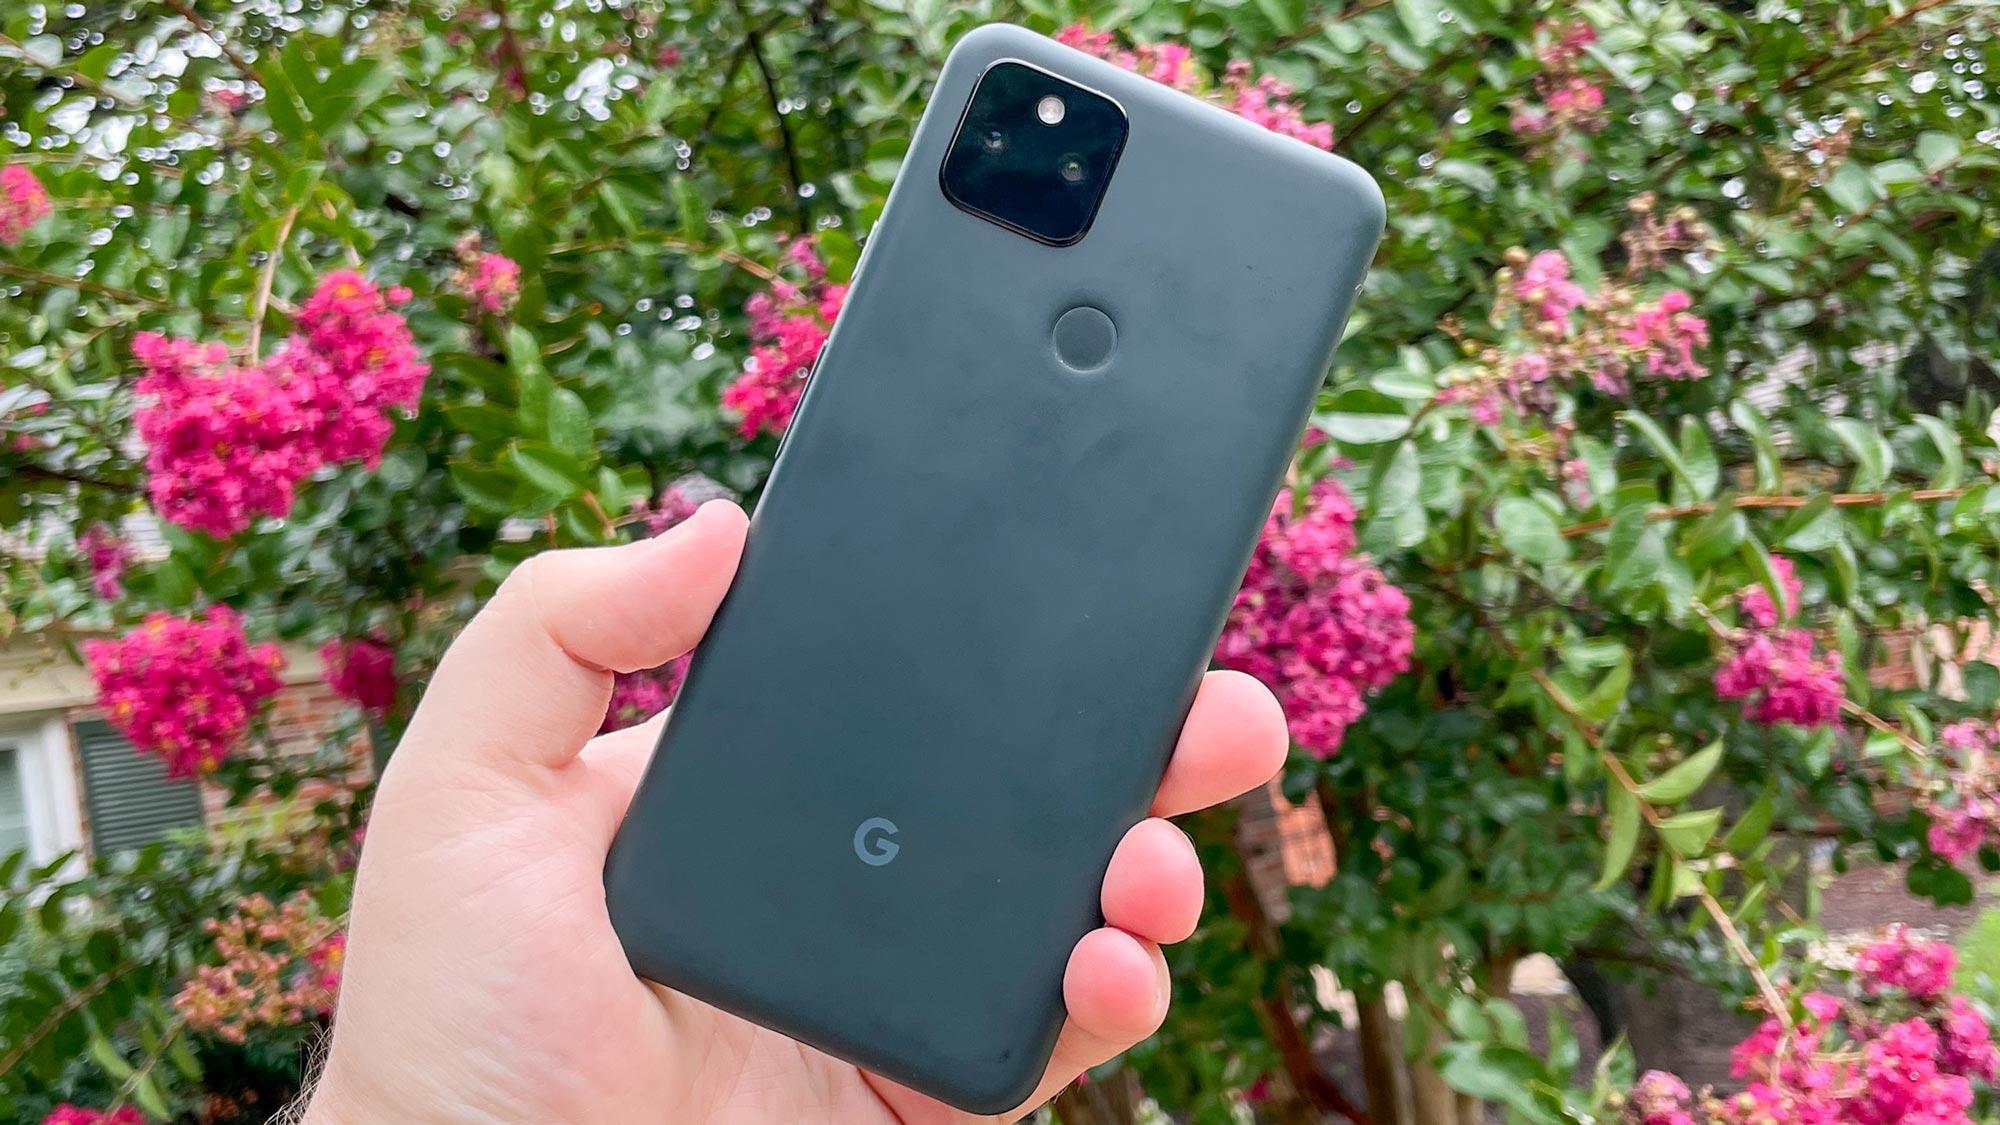 Google Pixel 5a review